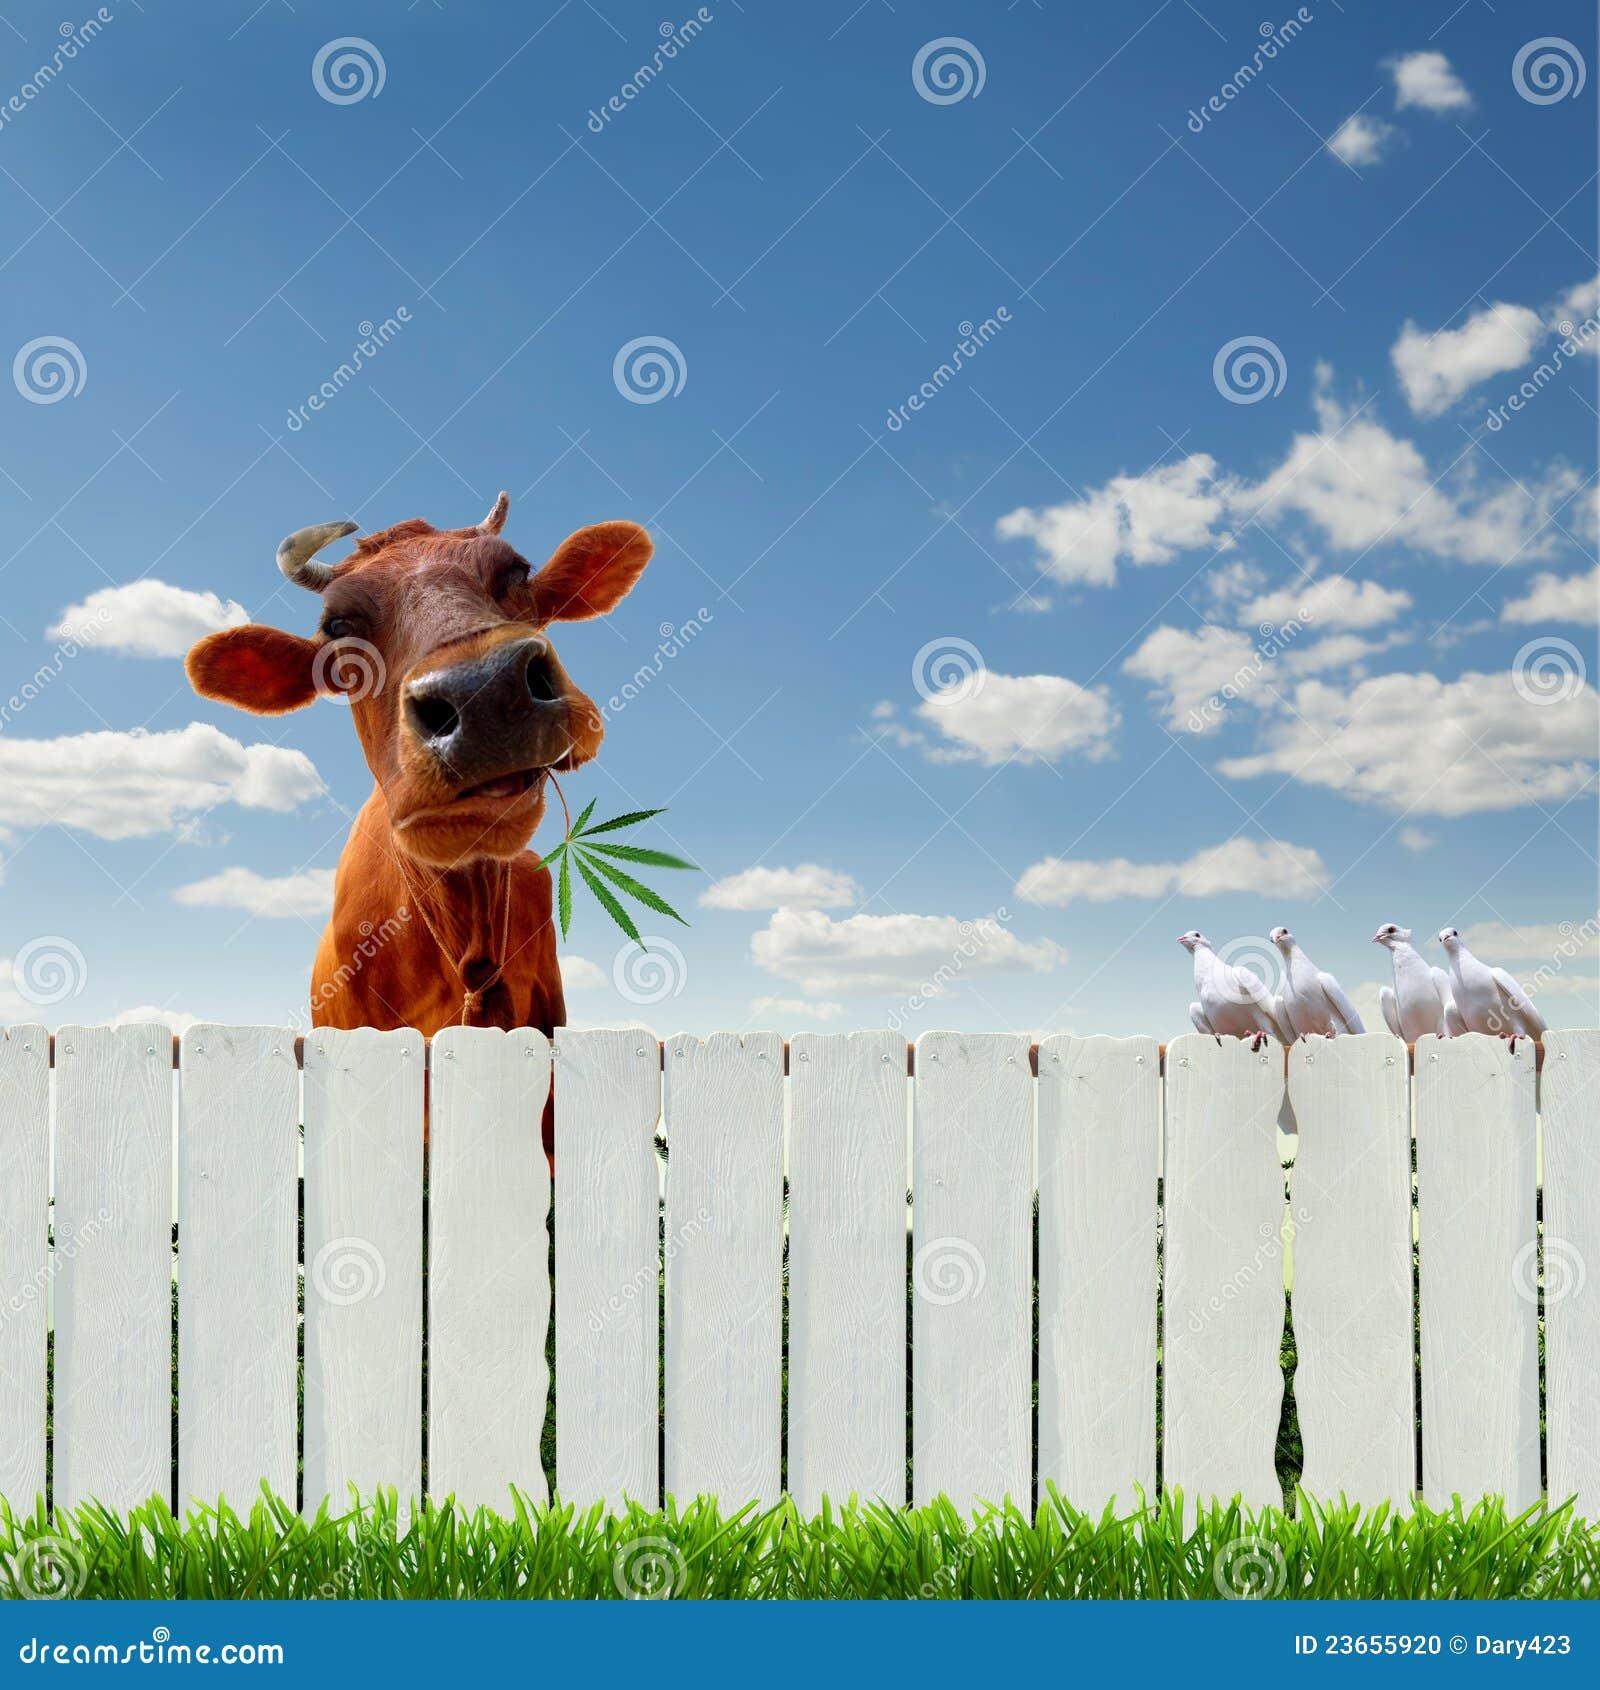 Cow With Marijuana Over The Fence Stock Photo Image